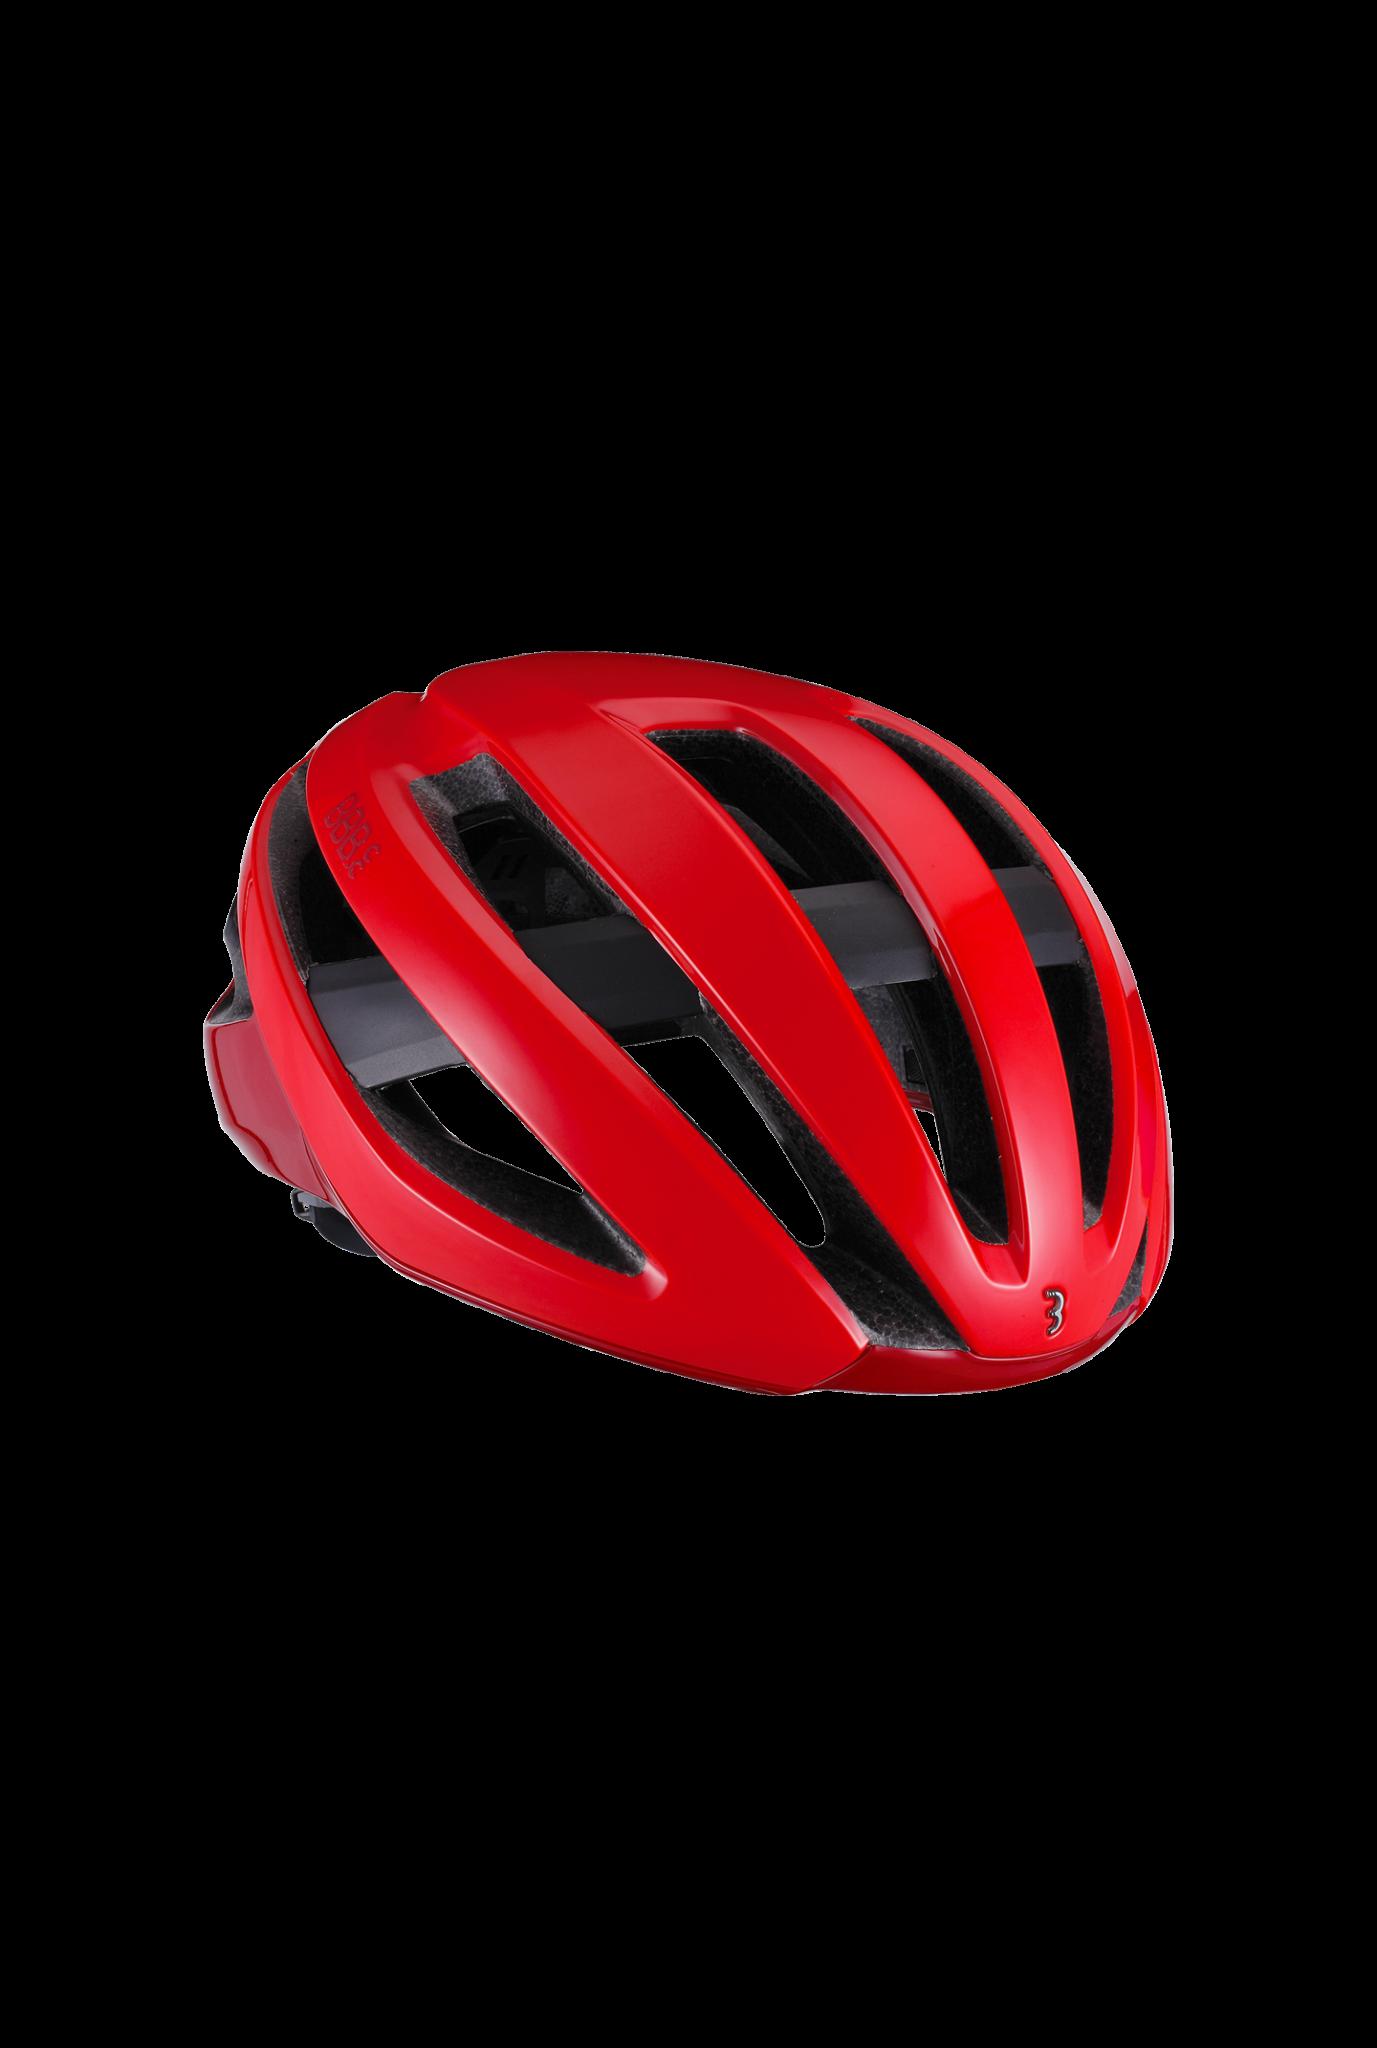 Helm Maestro glossy rood-1